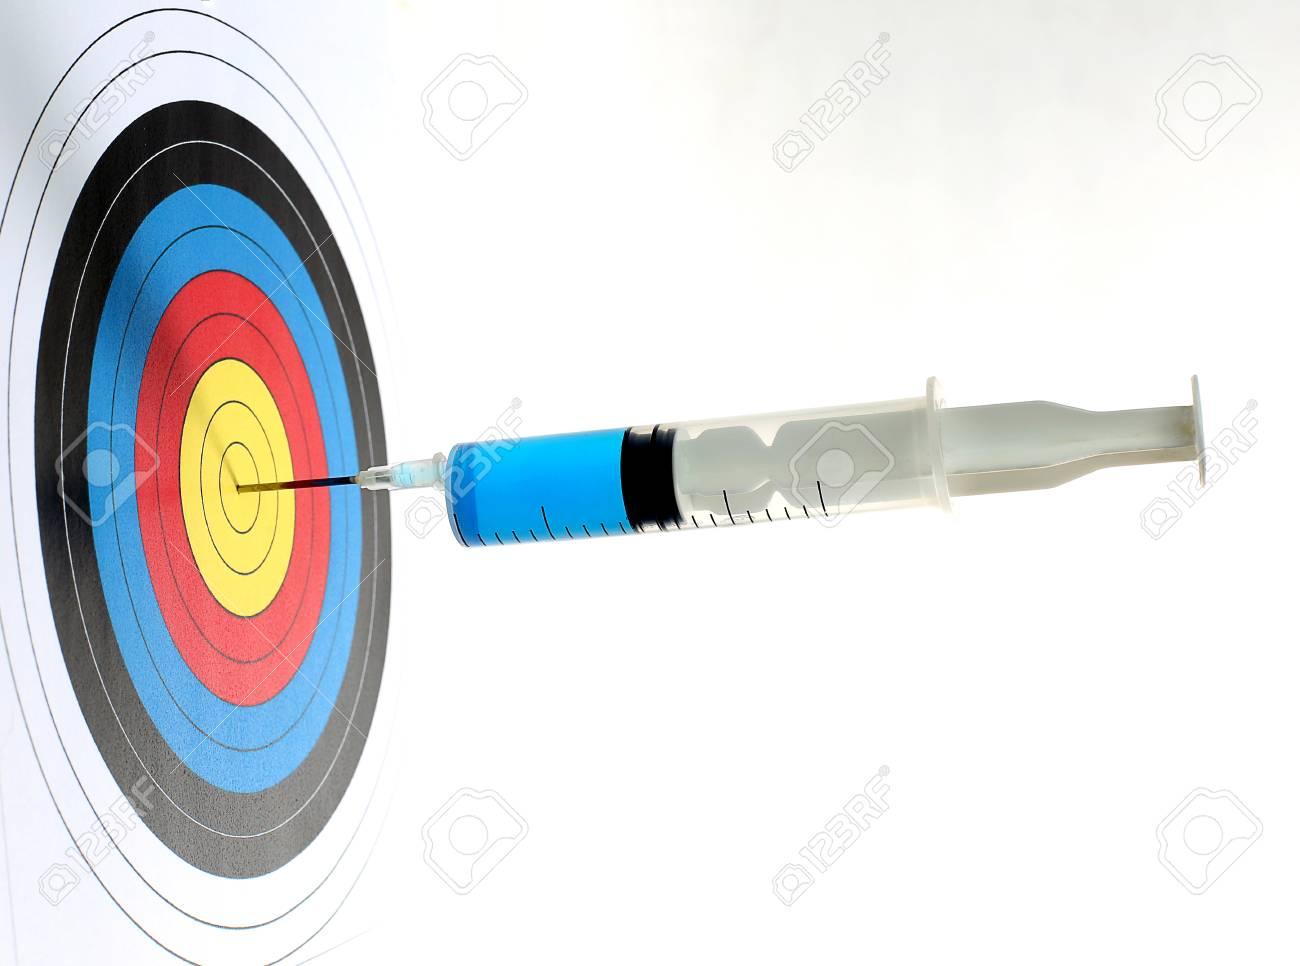 Precision medical syringes hit the bull's eye - 51164593